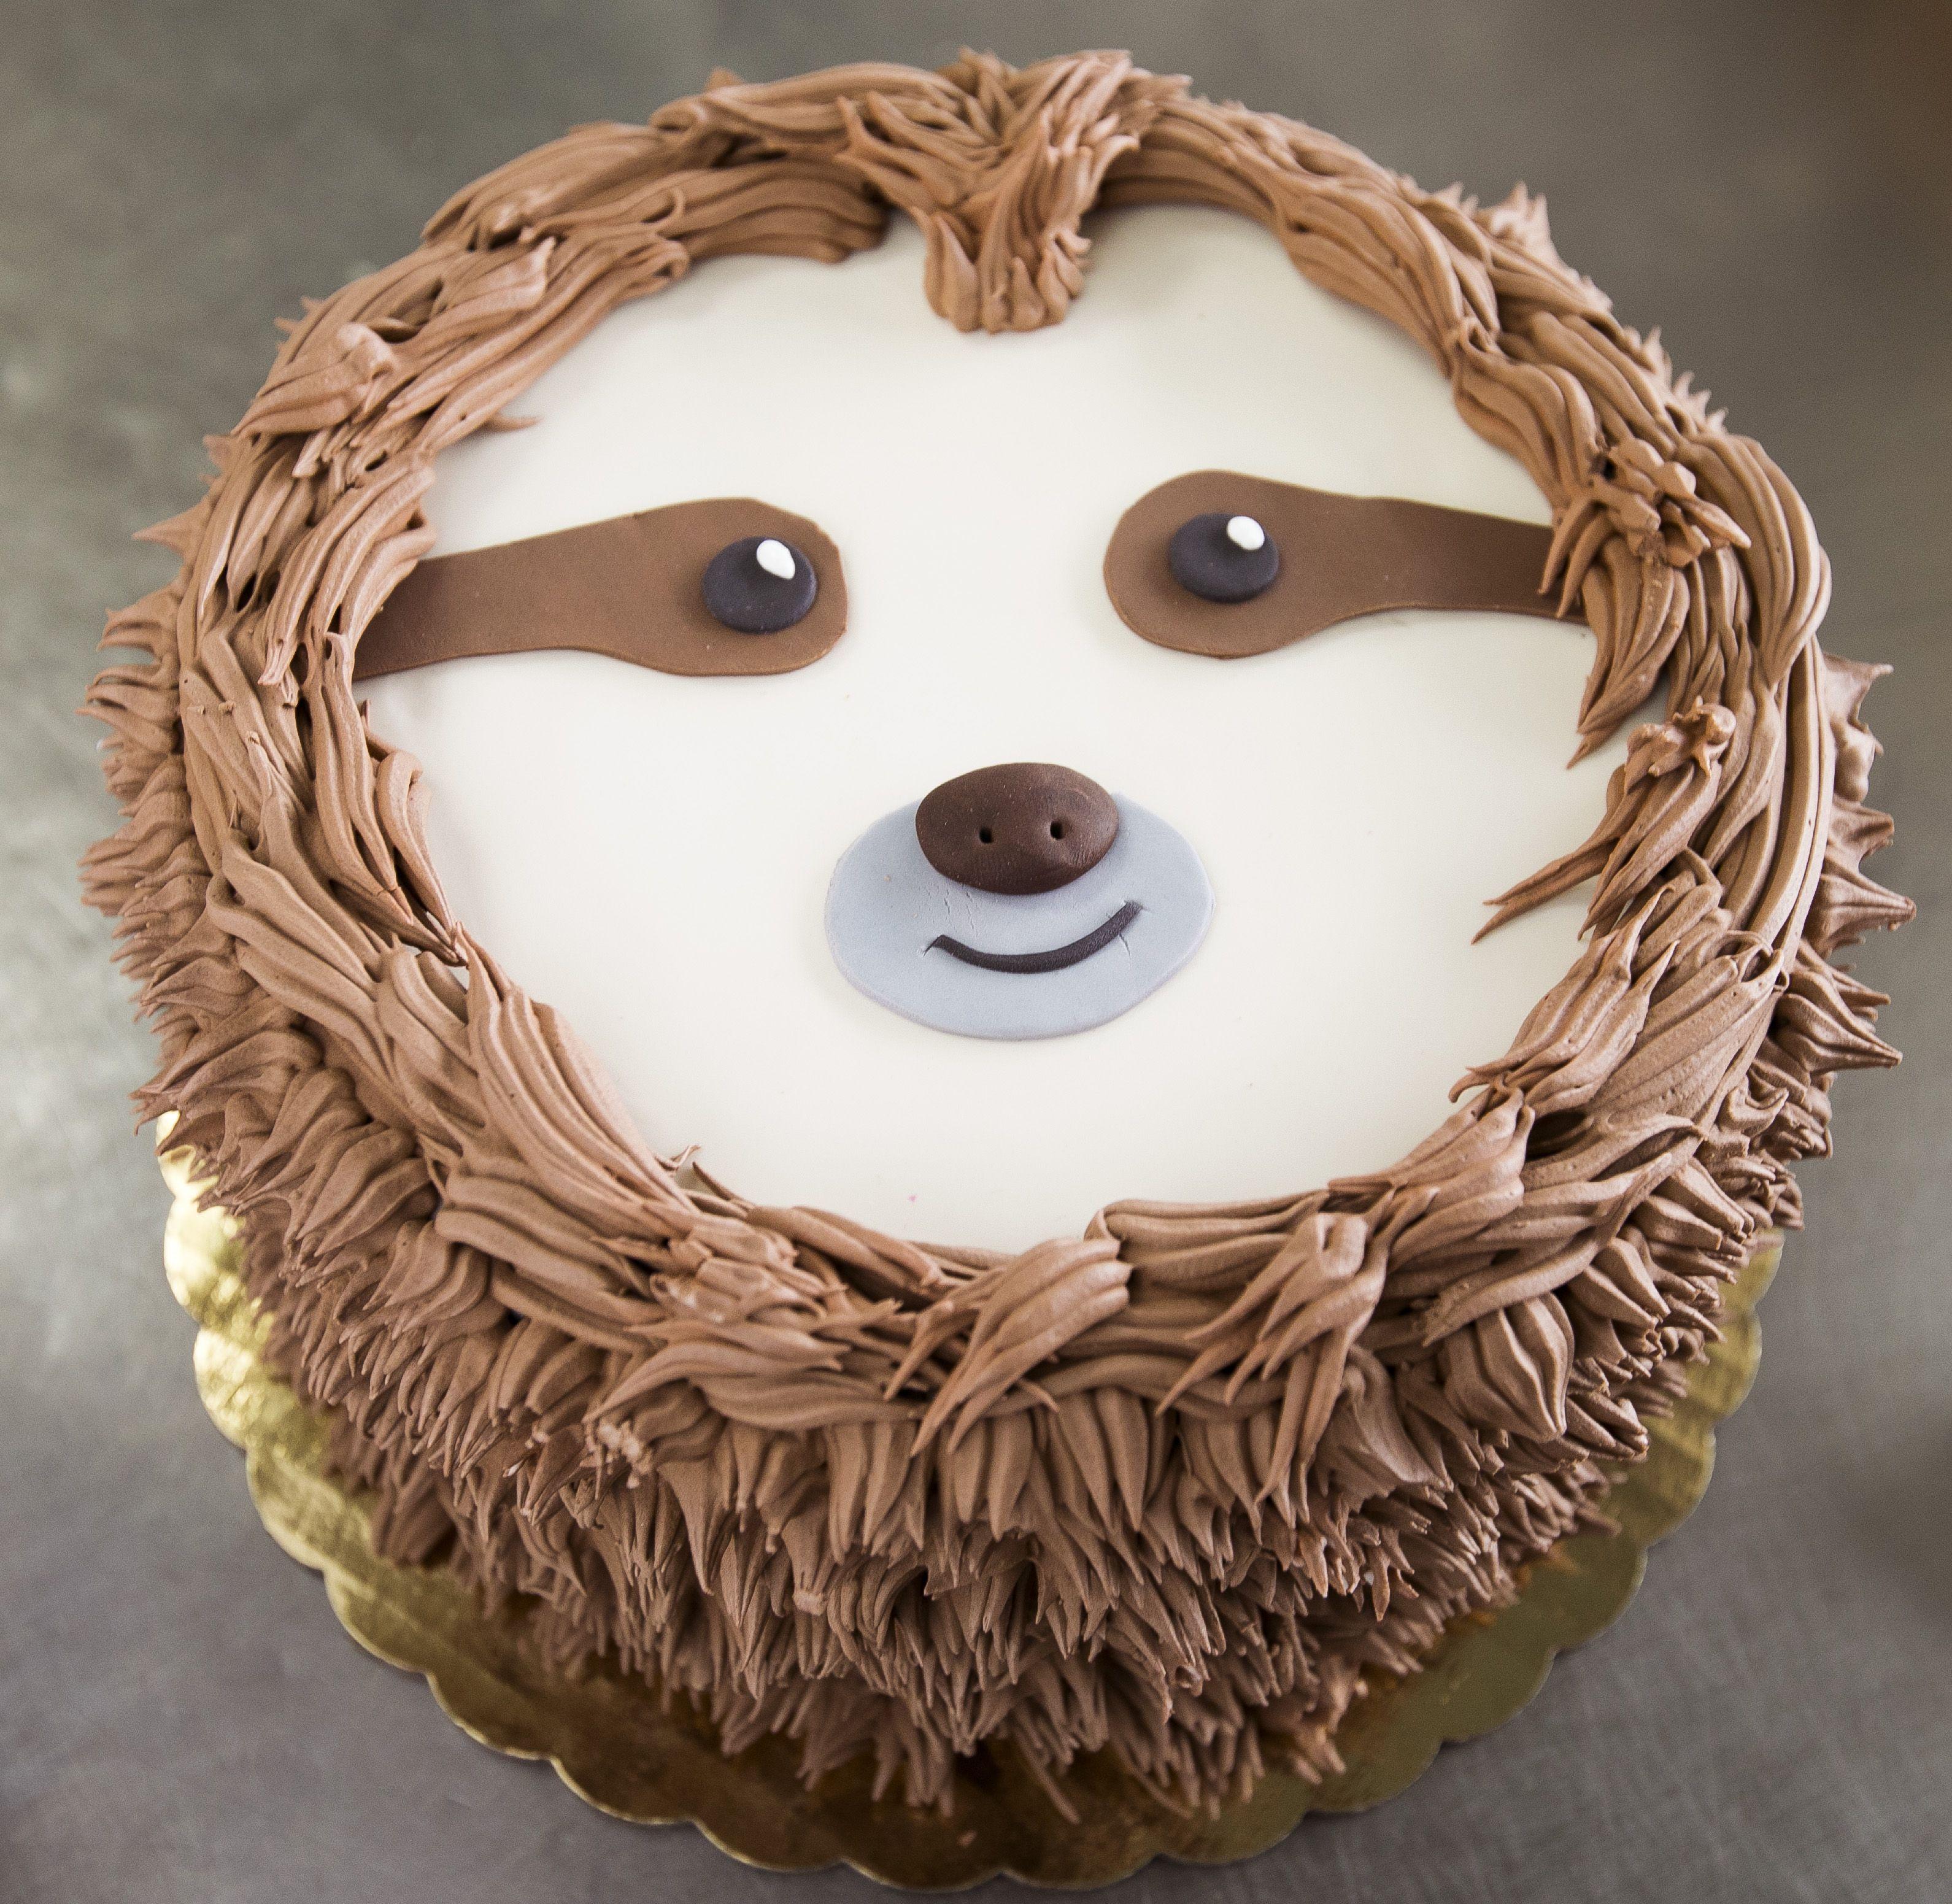 Sloth Birthday Cake Sloth Birthday Cake My Birthday Cake Sloth Birthday